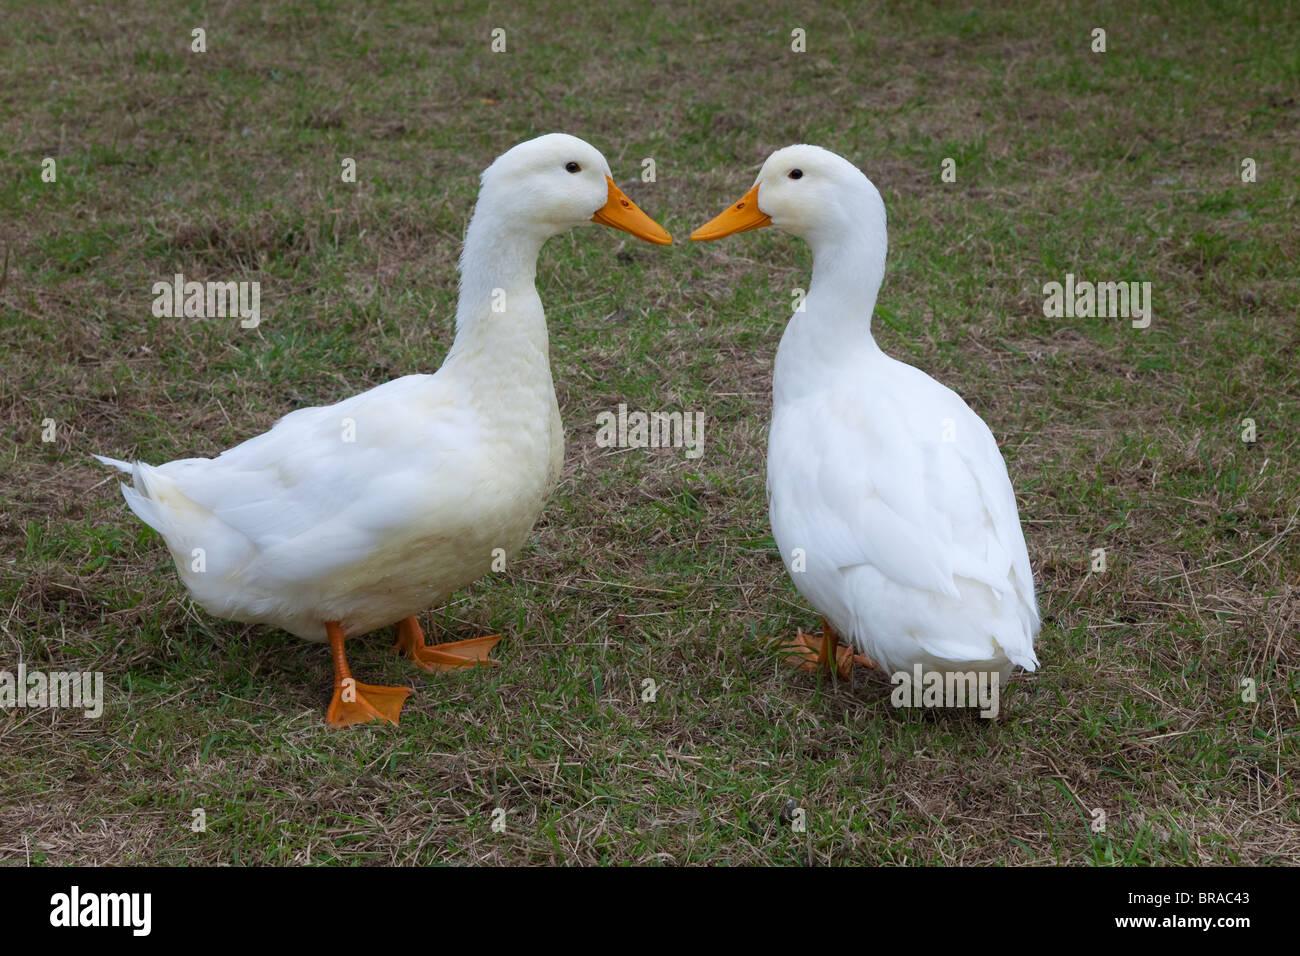 Pair of Aylesbury Ducks on smallholding - Stock Image